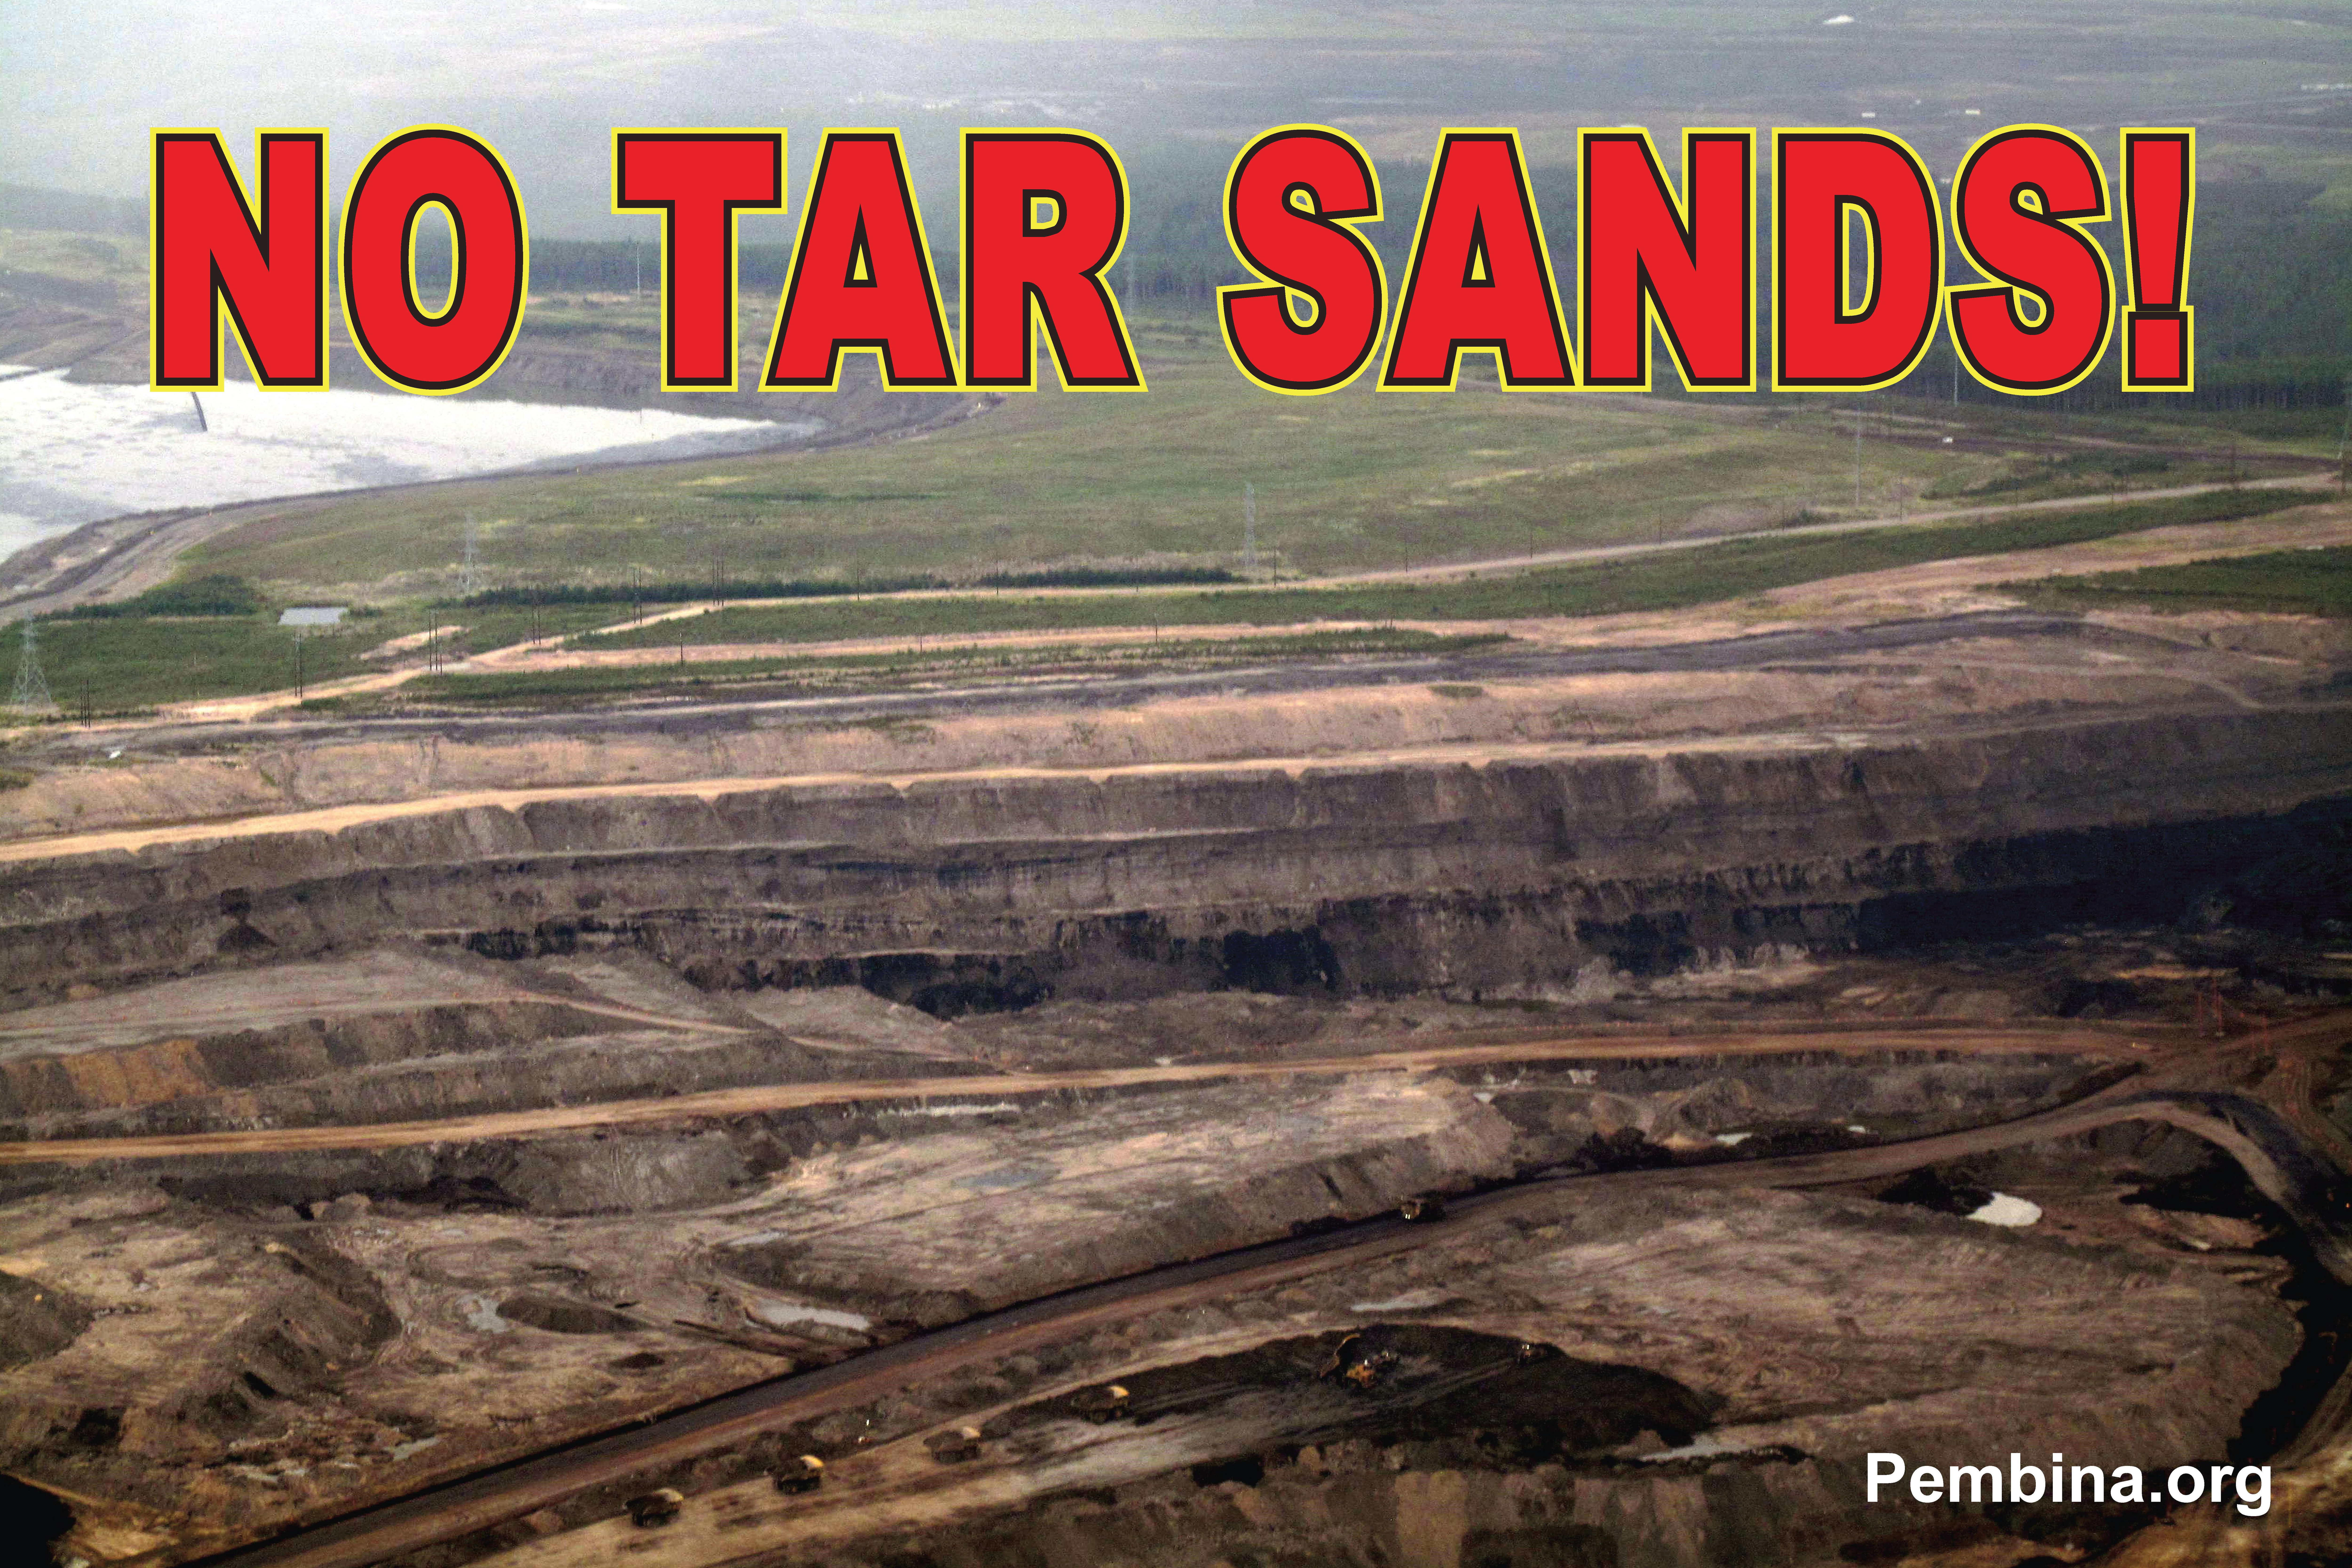 No_tar_sands_(1)